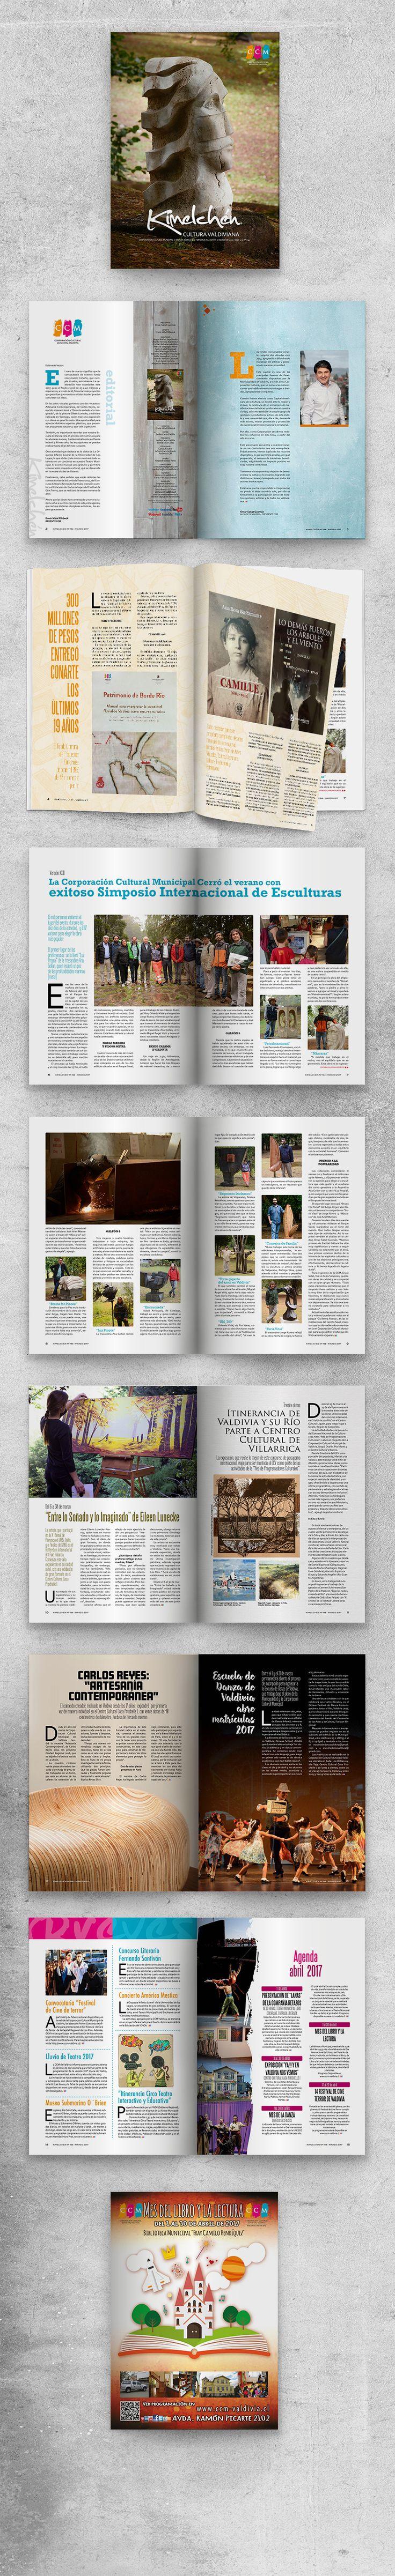 Diseño y diagramación Revista Kimelchen nº194 - marzo 2017 - CCM Centro Cultural Municipal de Valdivia